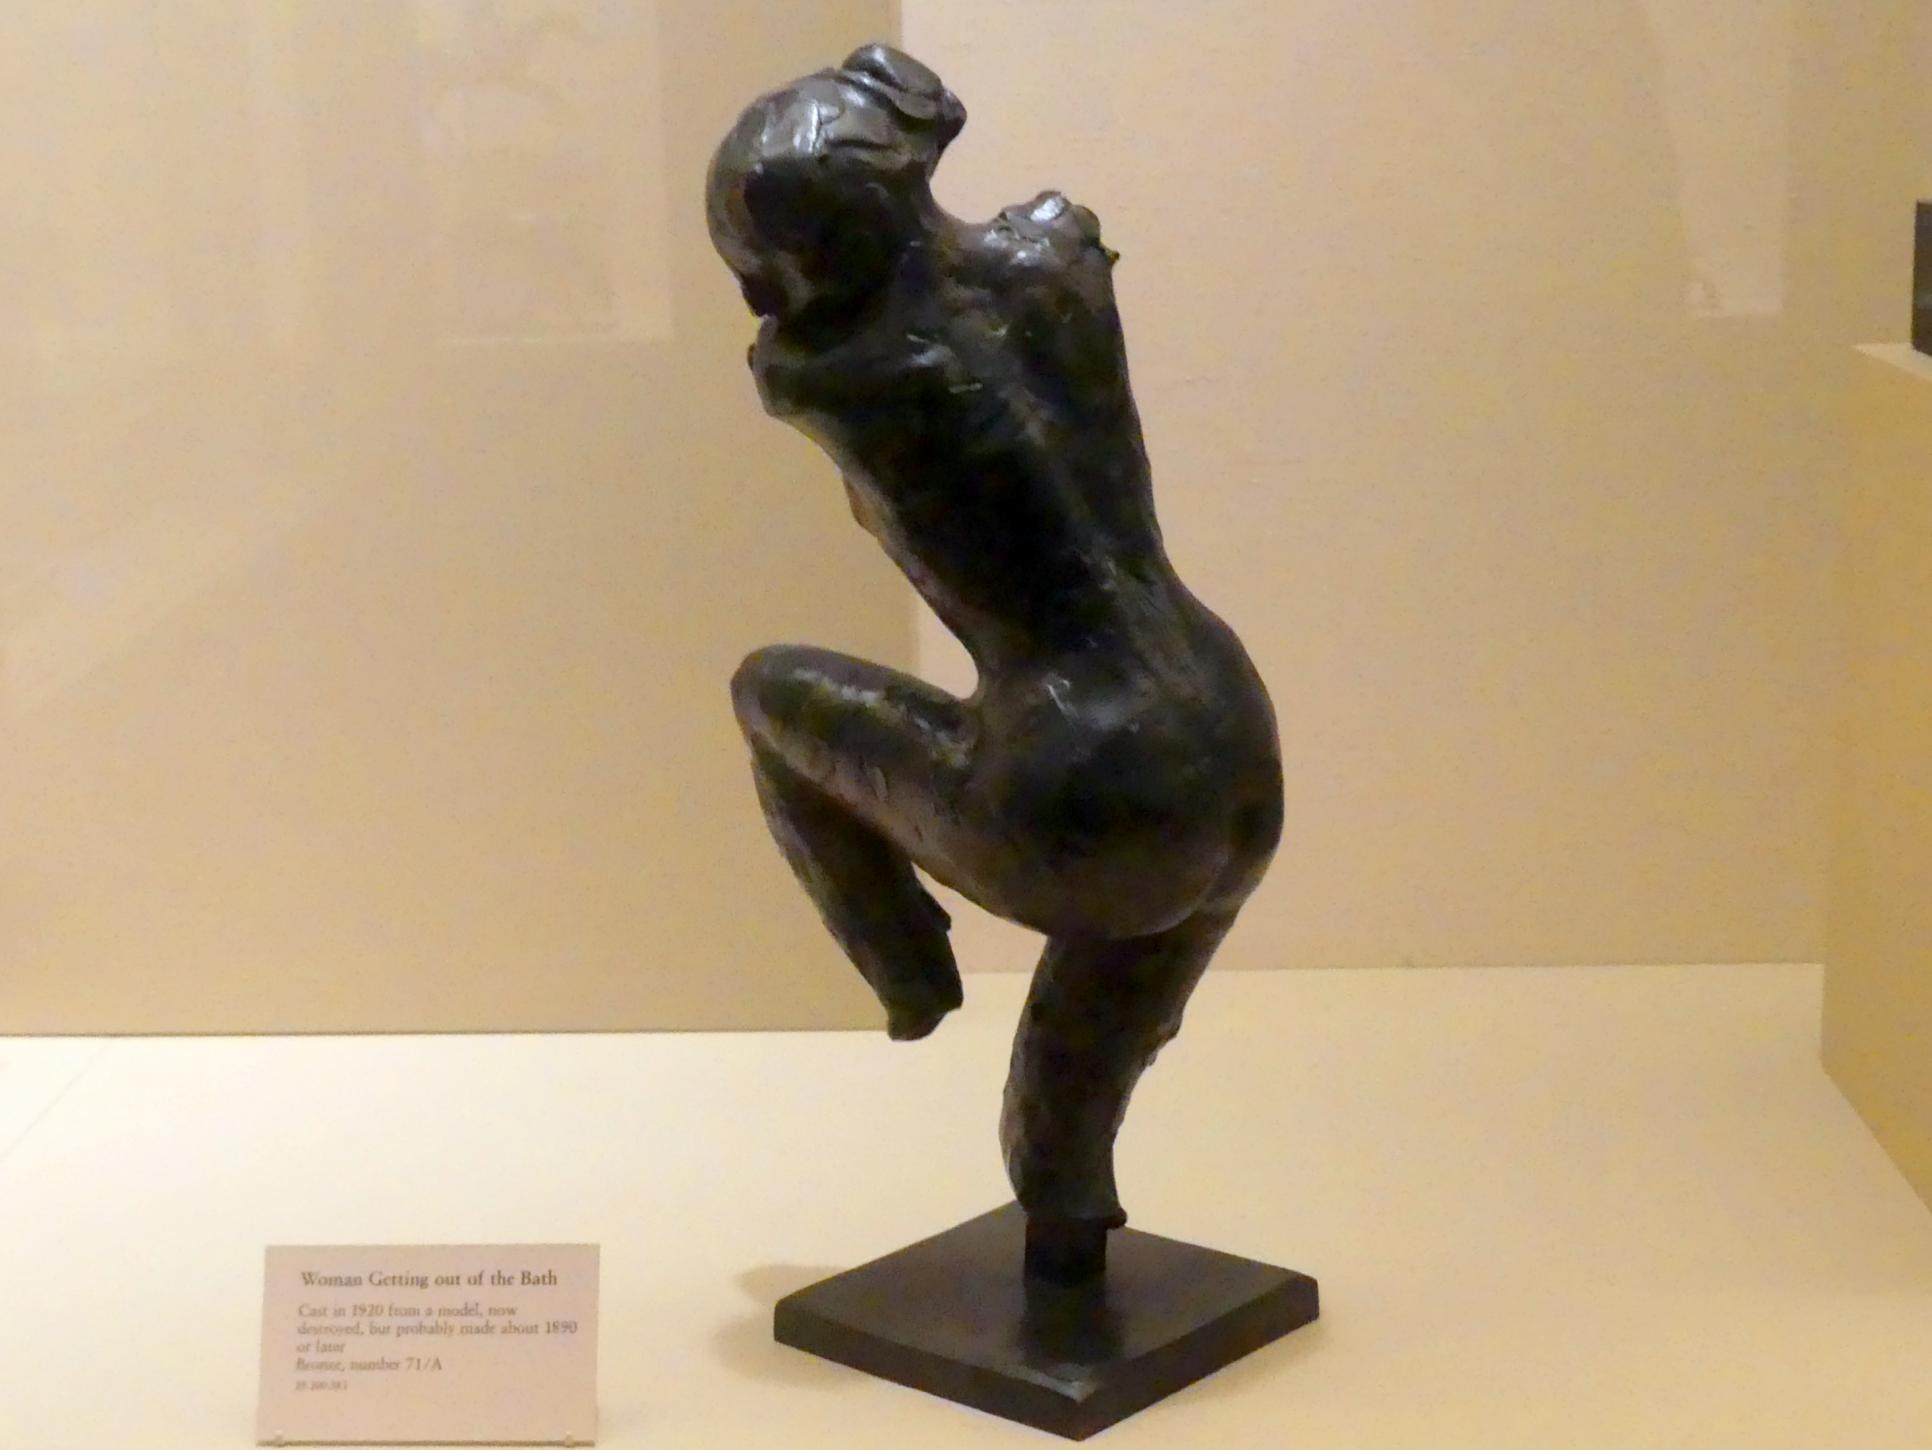 Edgar Degas: Frau aus dem Bad steigend, nach 1890